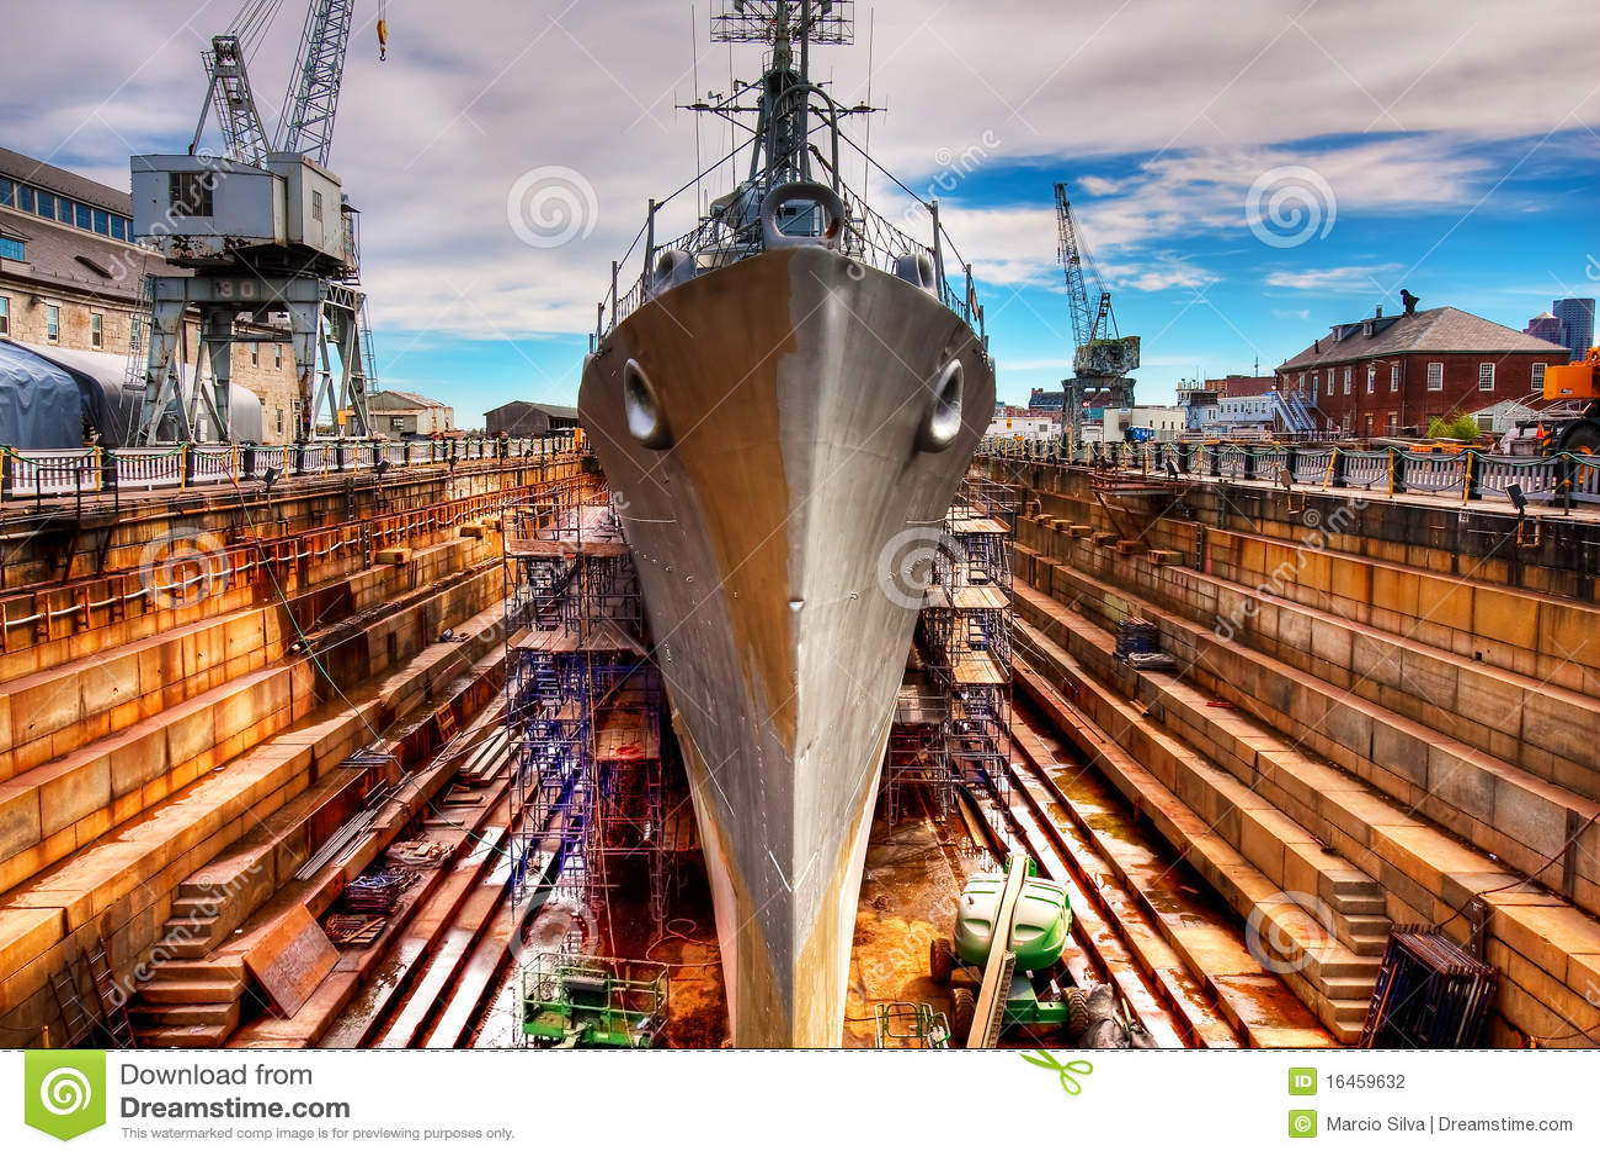 Shipyard business plan